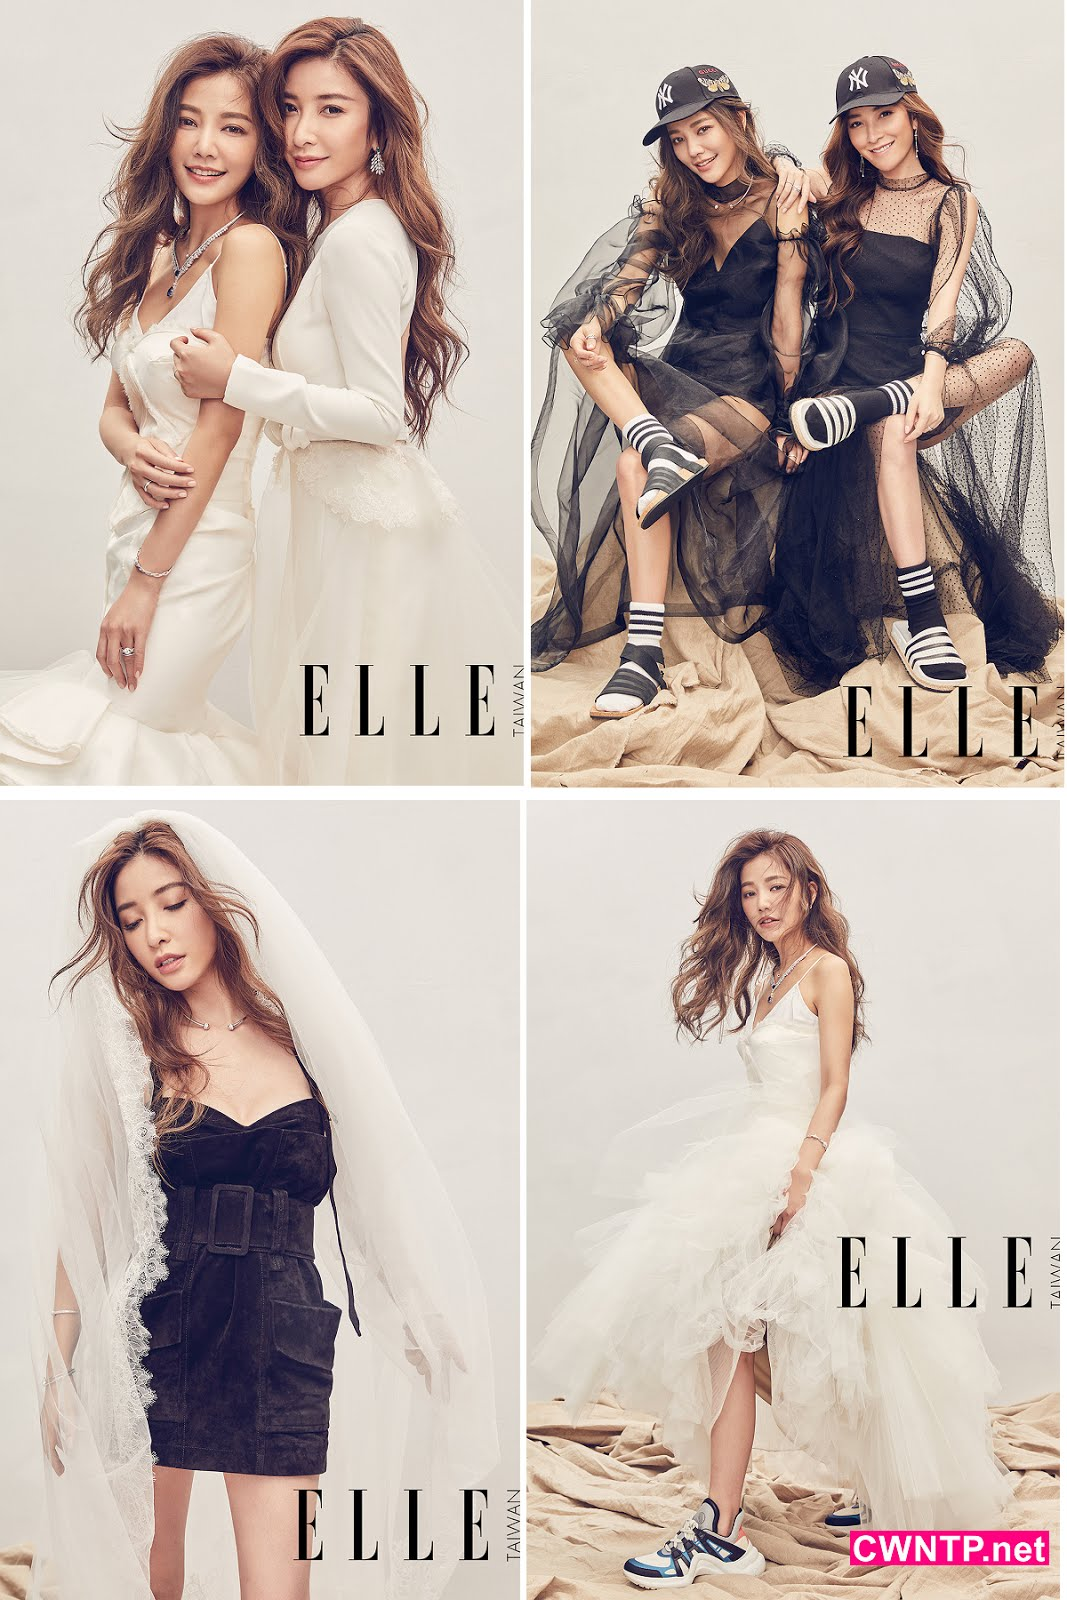 CWNTP 流行: ELLE WEDDING6月號封面之星 許路兒&許維恩時尚「衣」Q大考驗 - 華人世界時報 CWNTP